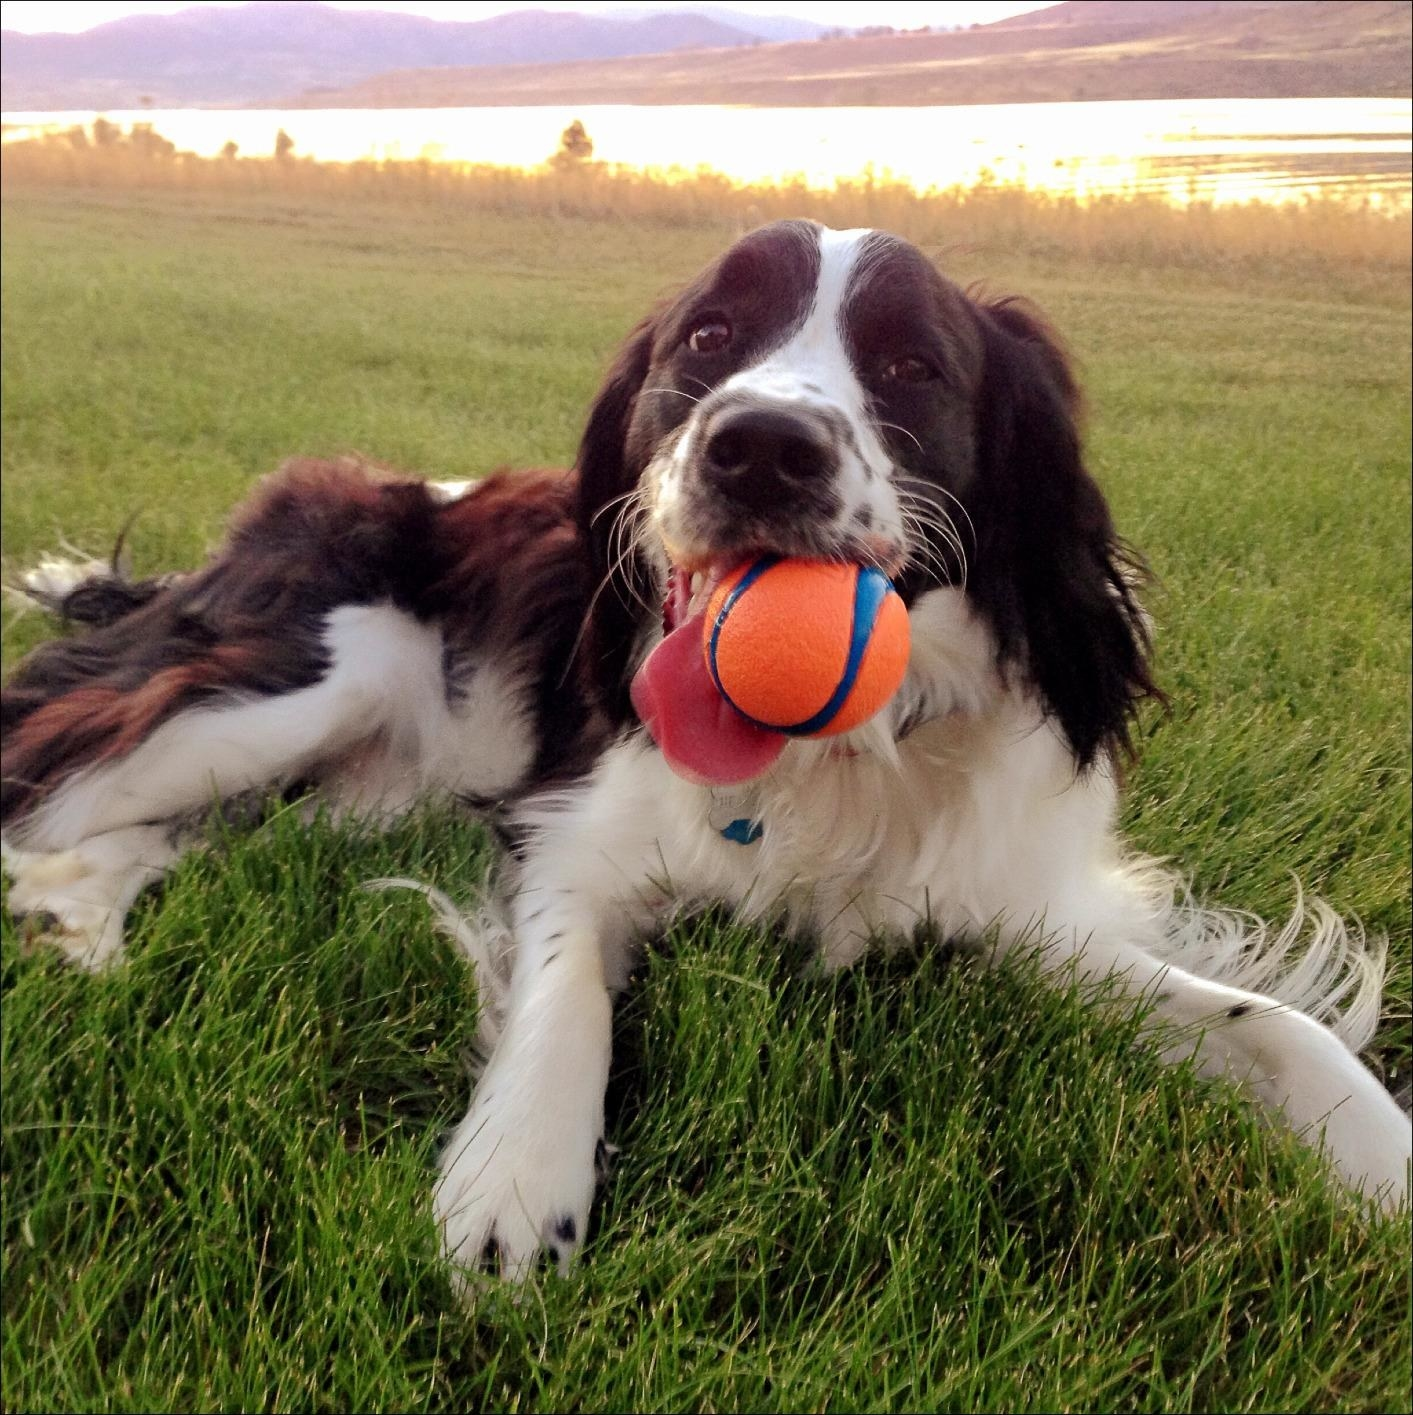 A dog chews on the ball